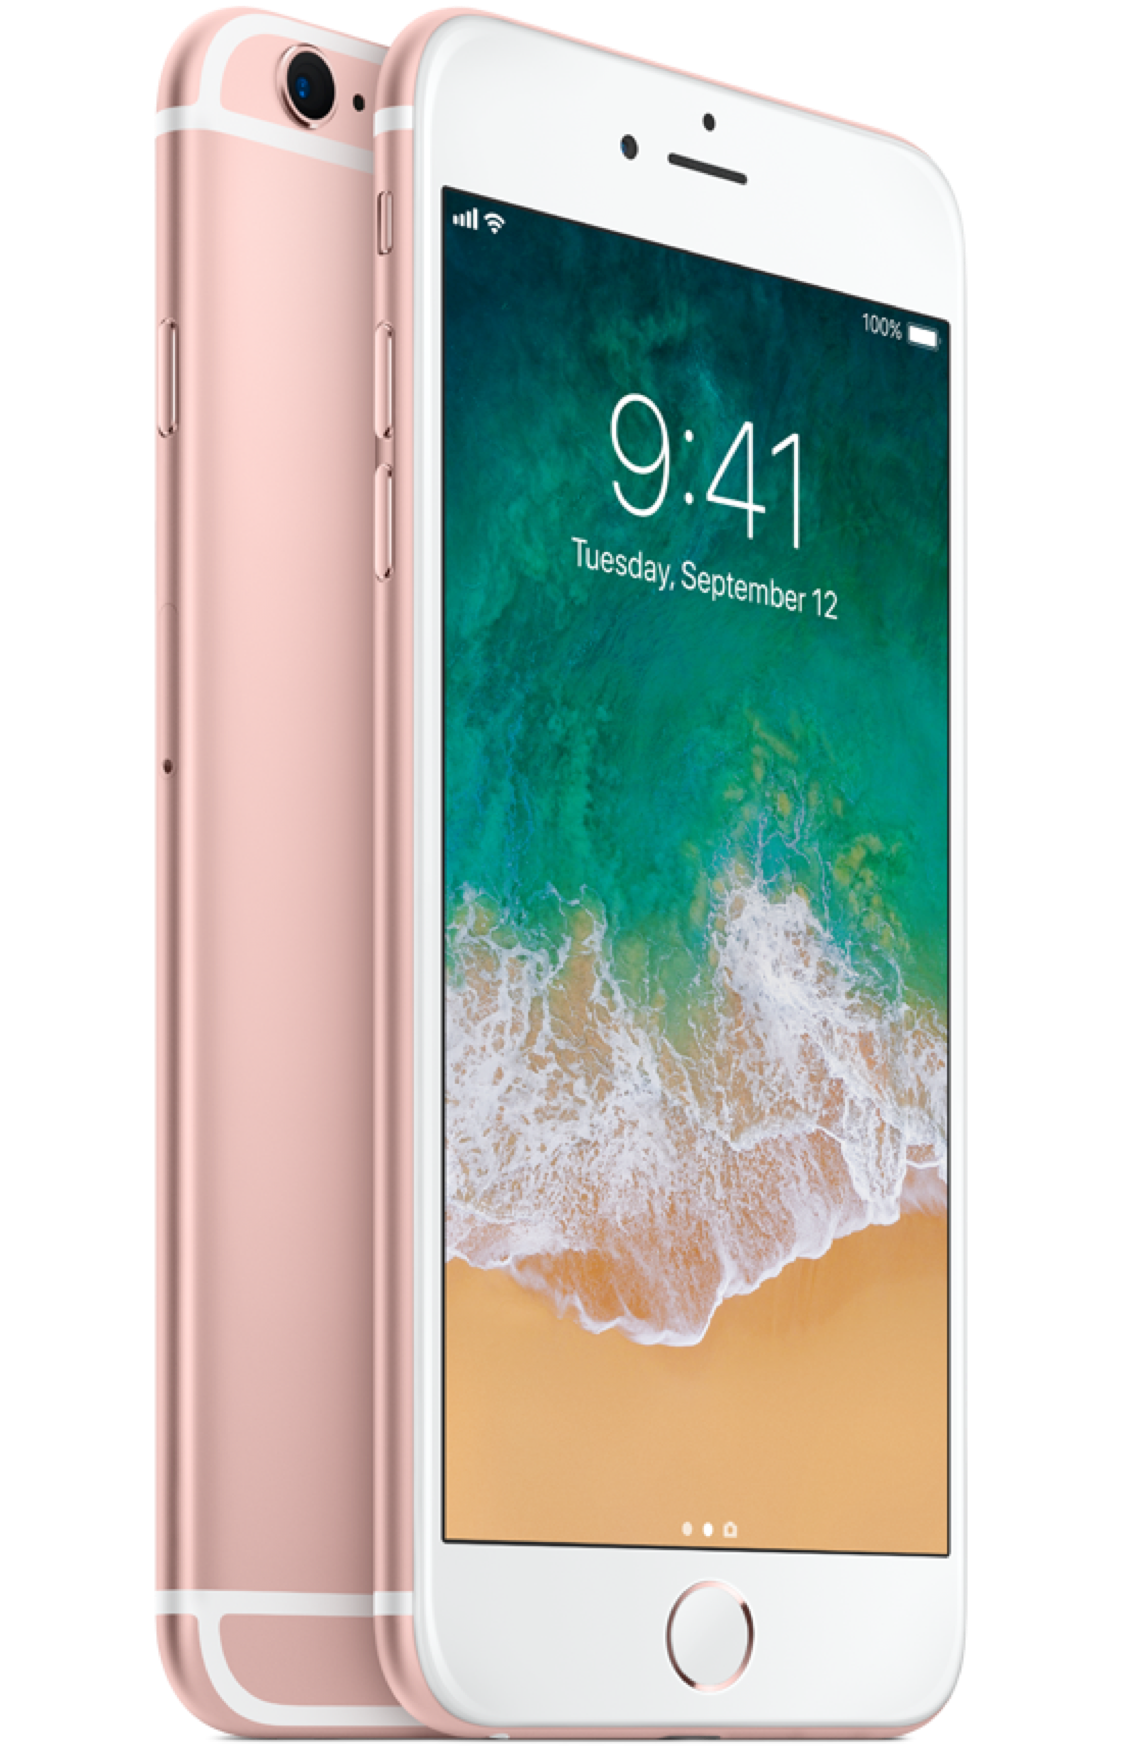 Apple Iphone 6s Plus 16gb Rose Gold Refurbished Boost Mobile Iphone Apple Iphone Iphone 6s Rose Gold